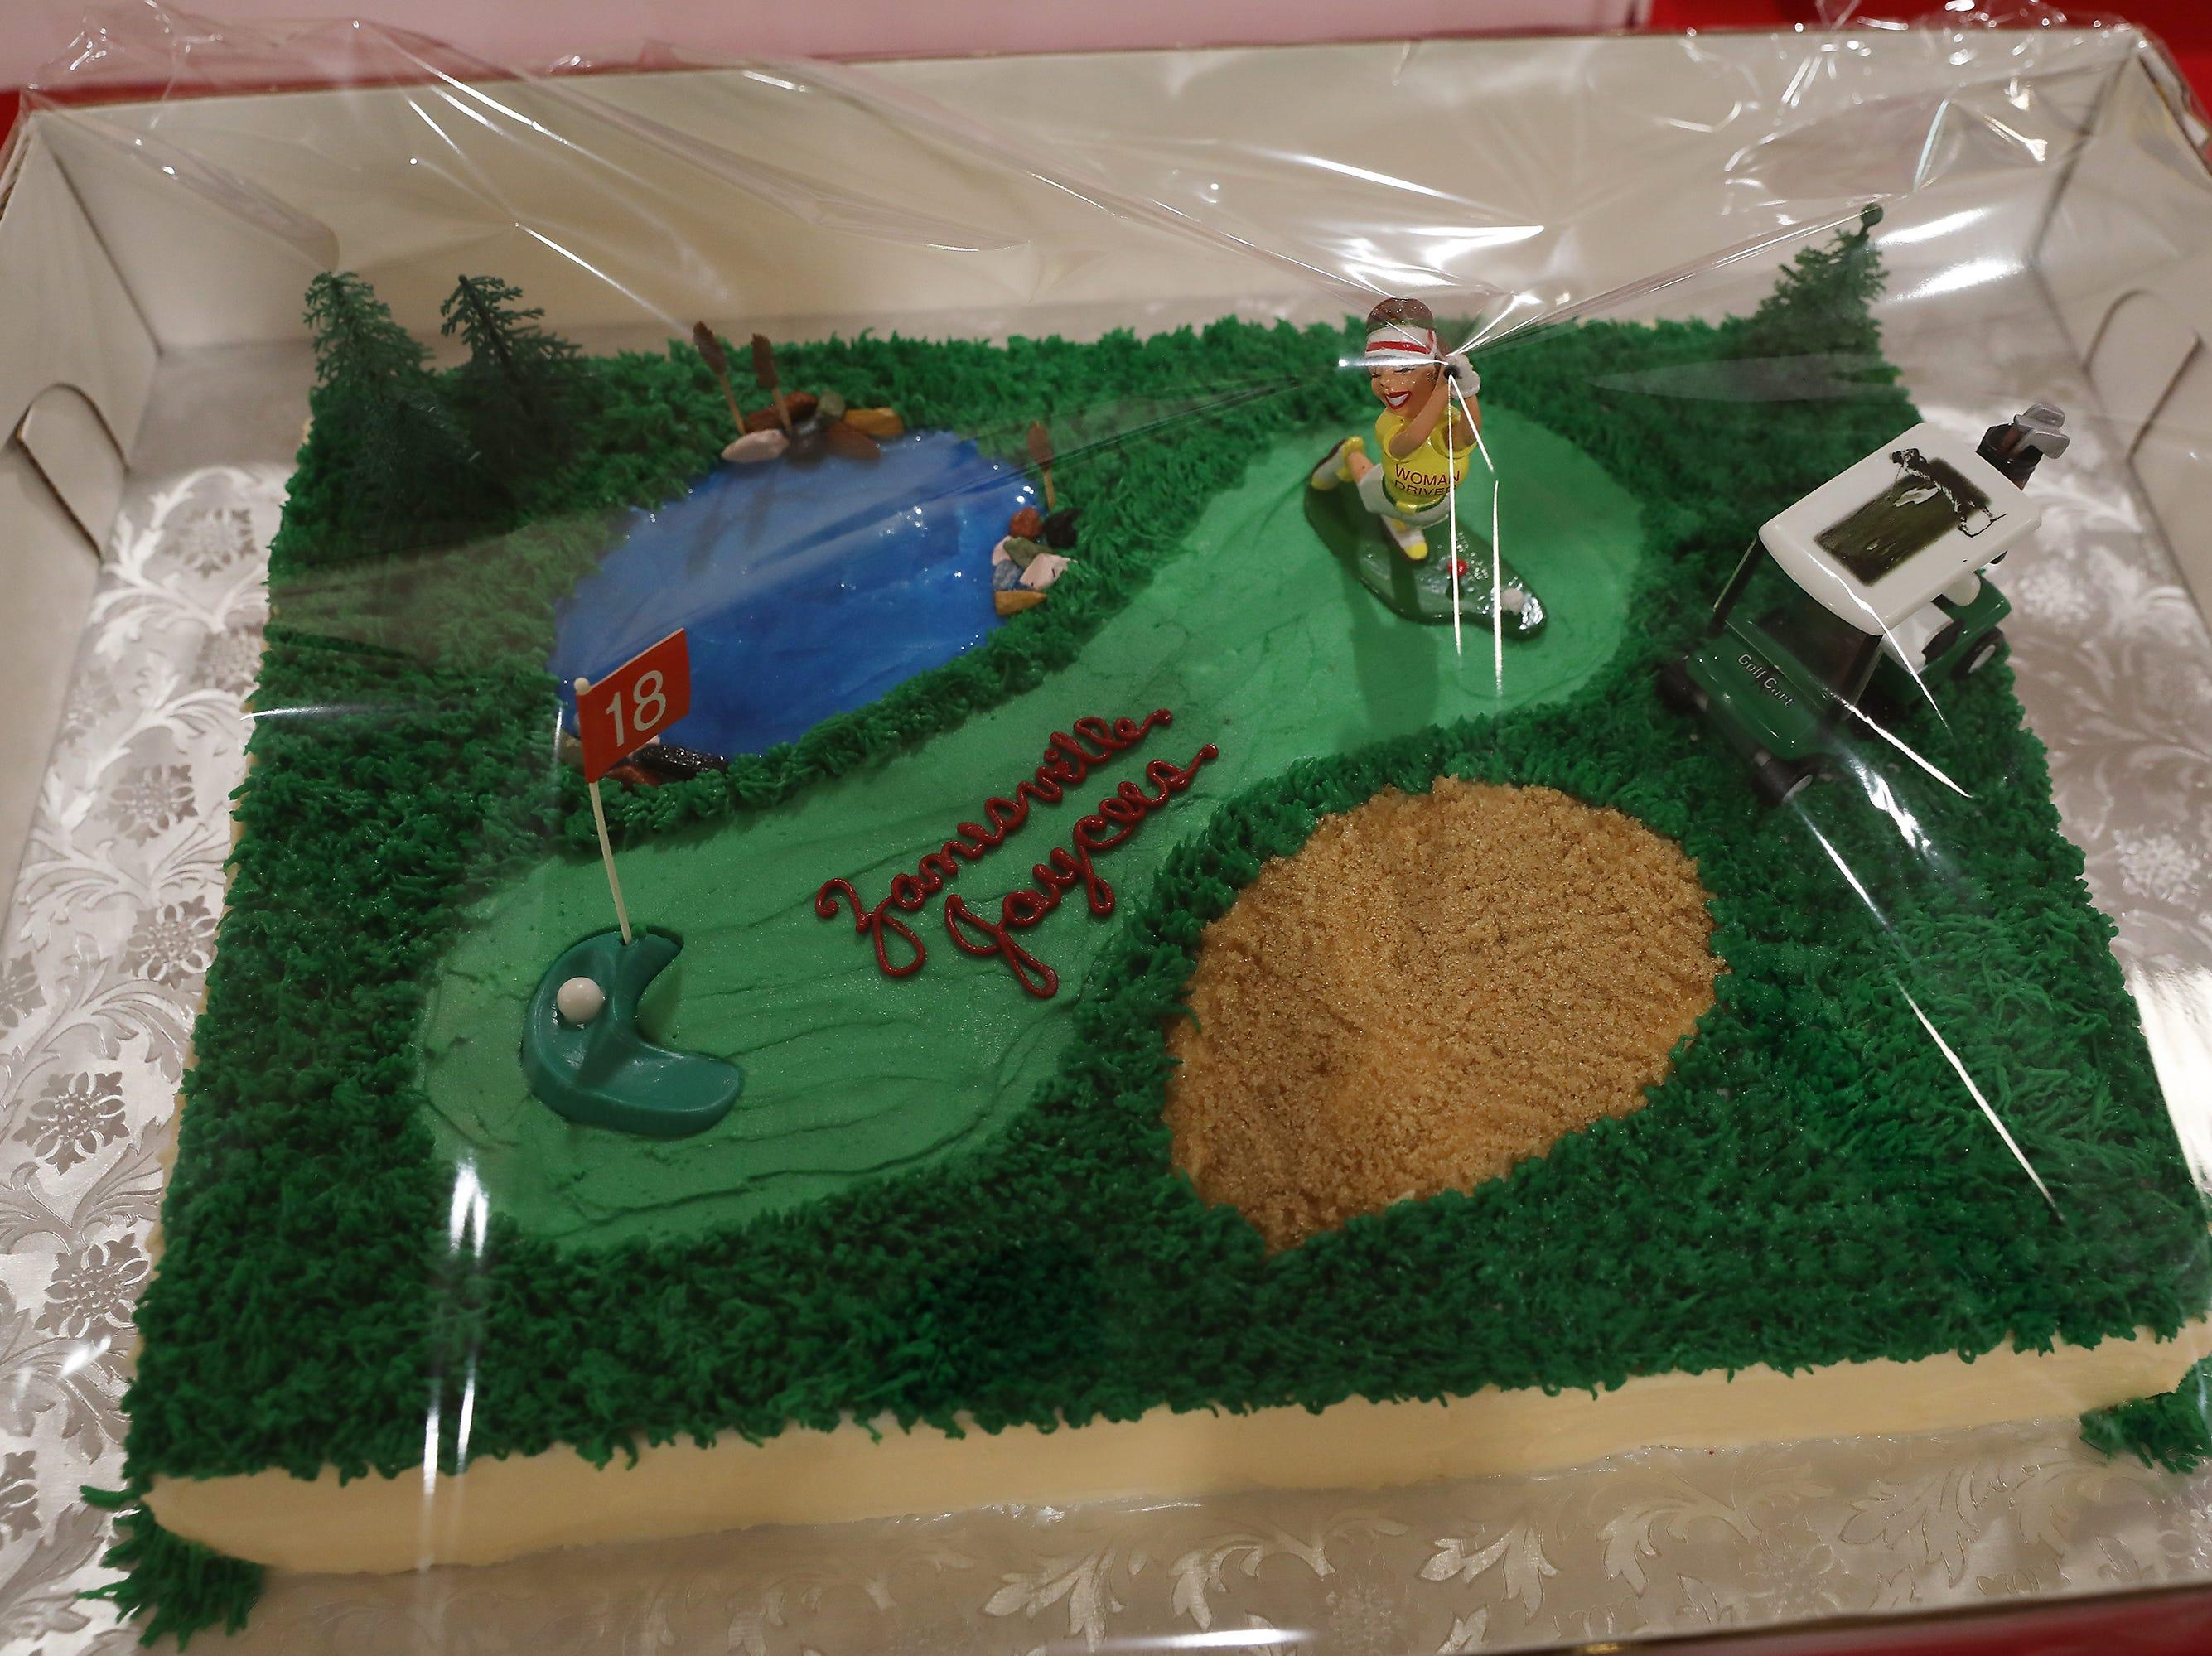 1:45 P.M. Thursday cake 114 Zanesville Jaycees Golf Club - Driver, 2 rounds of golf; $550